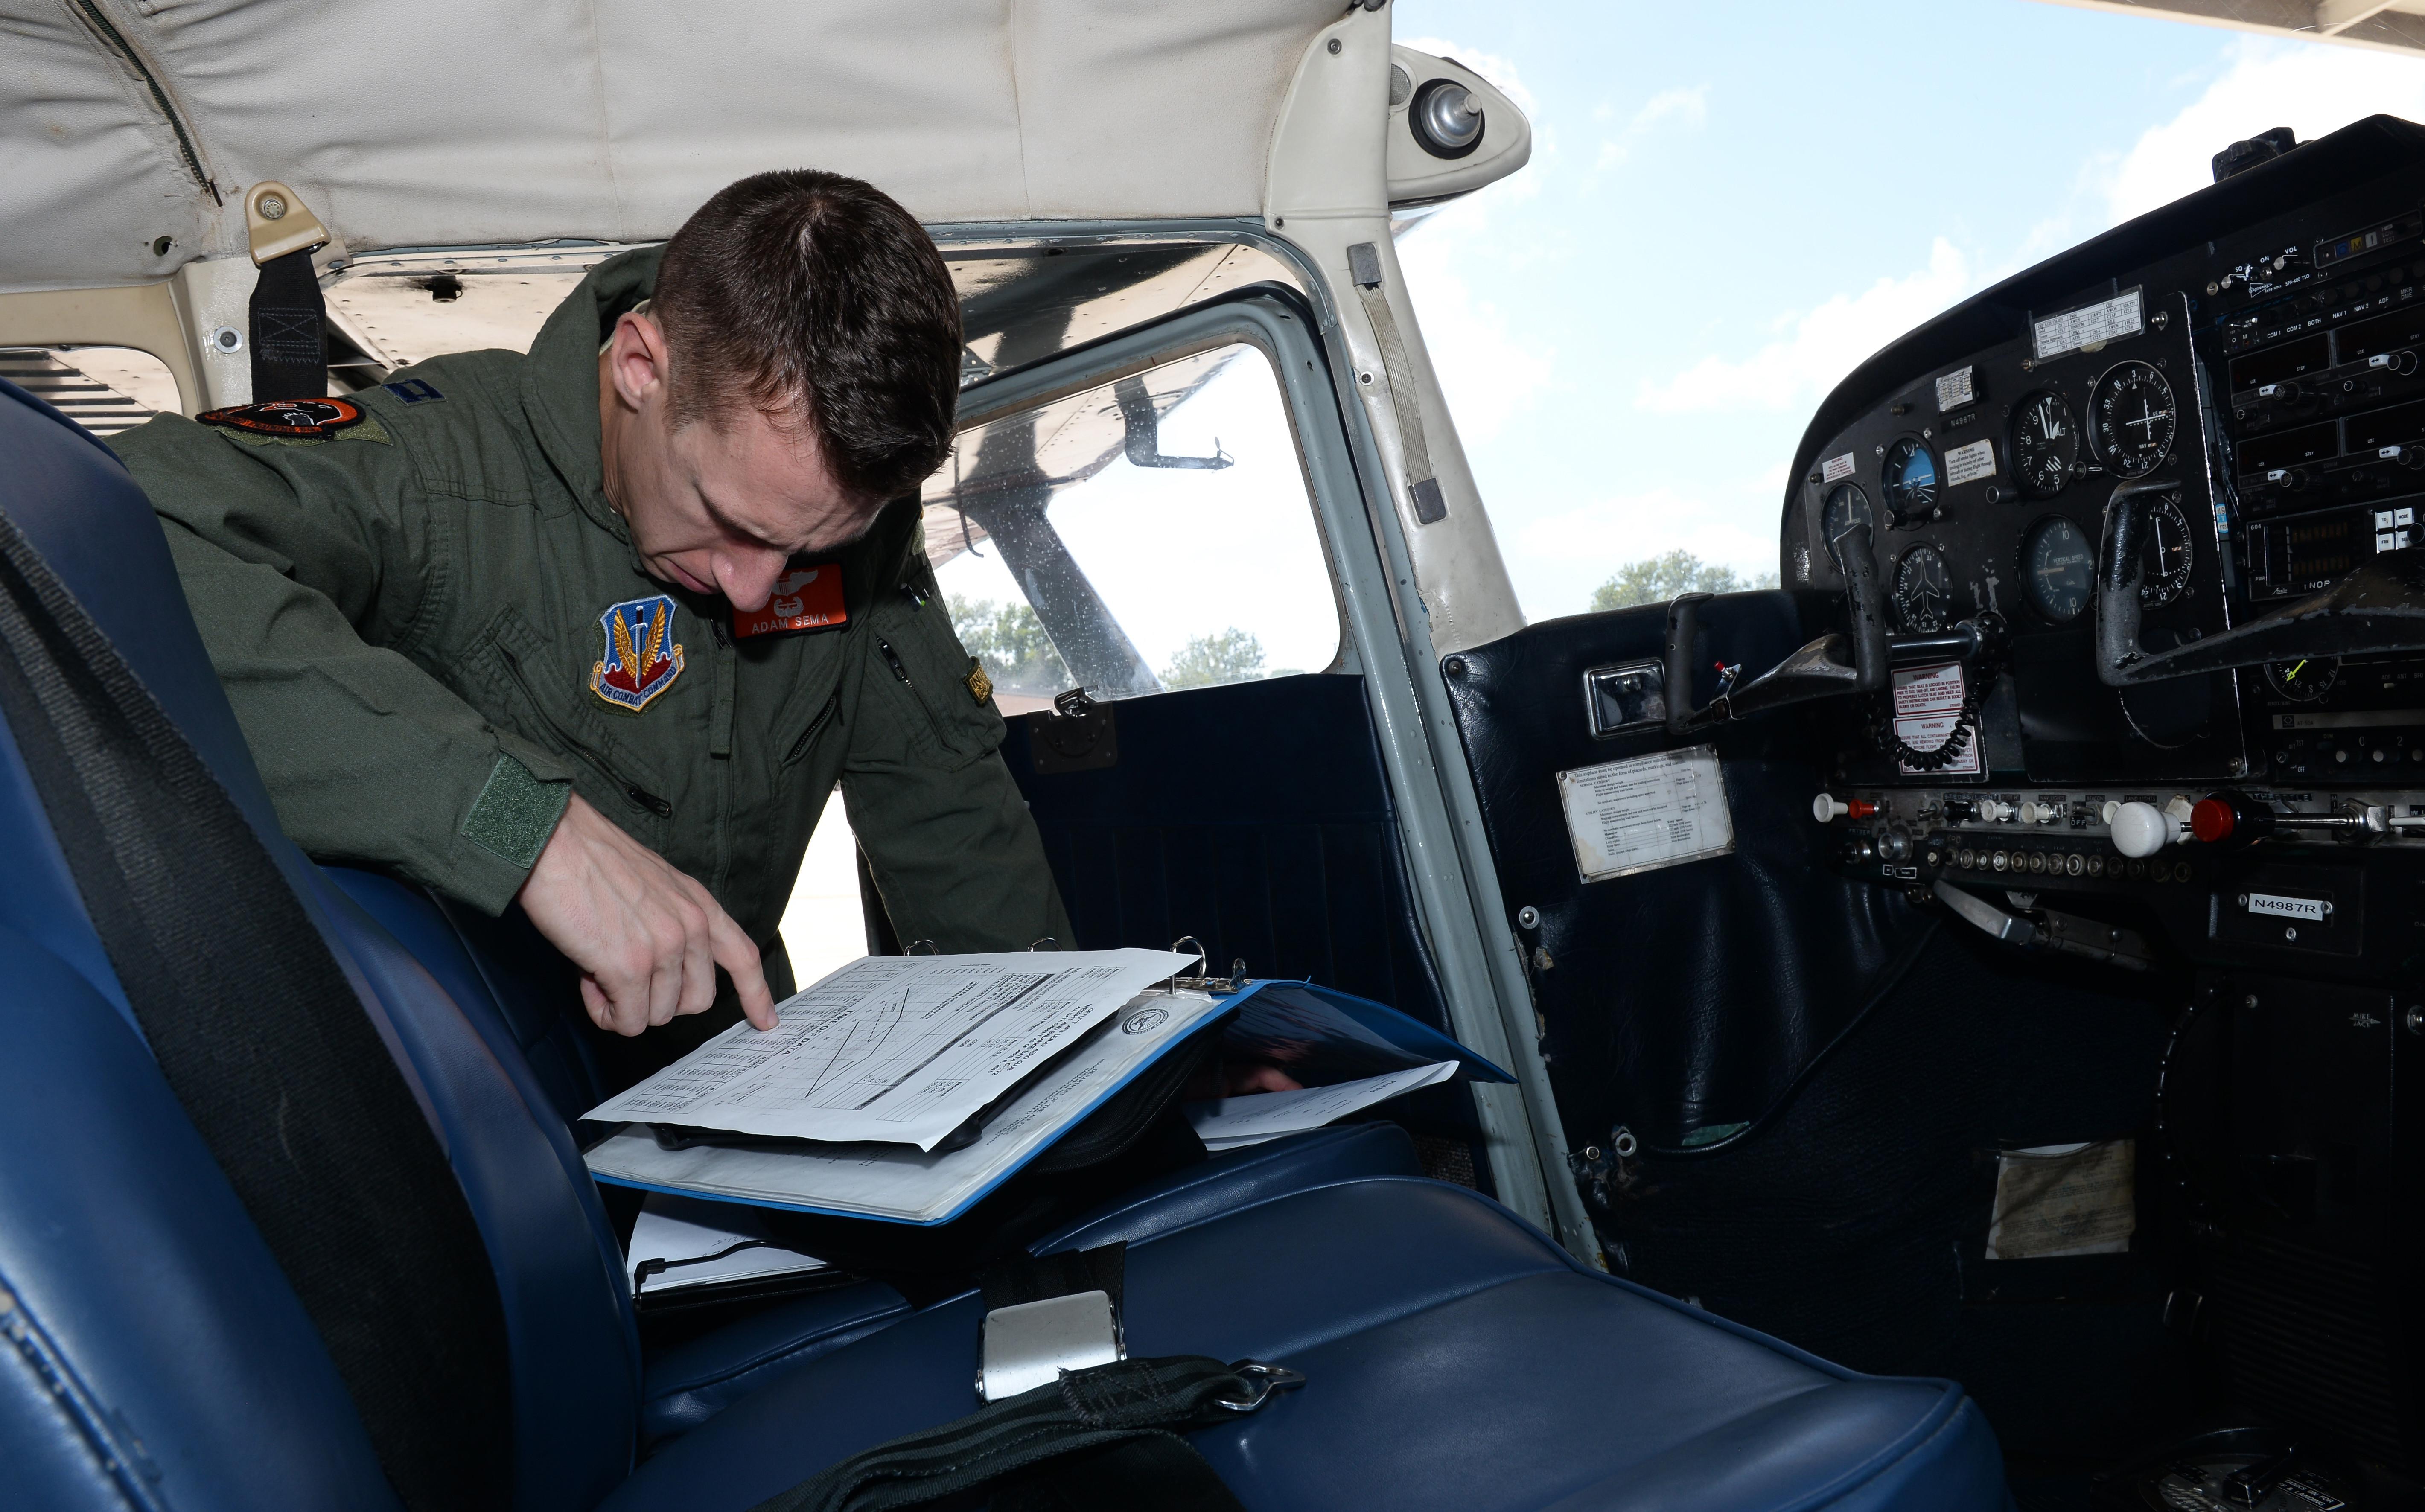 LeMay Aero Club offers flight lessons to Team Offutt > Offutt Air